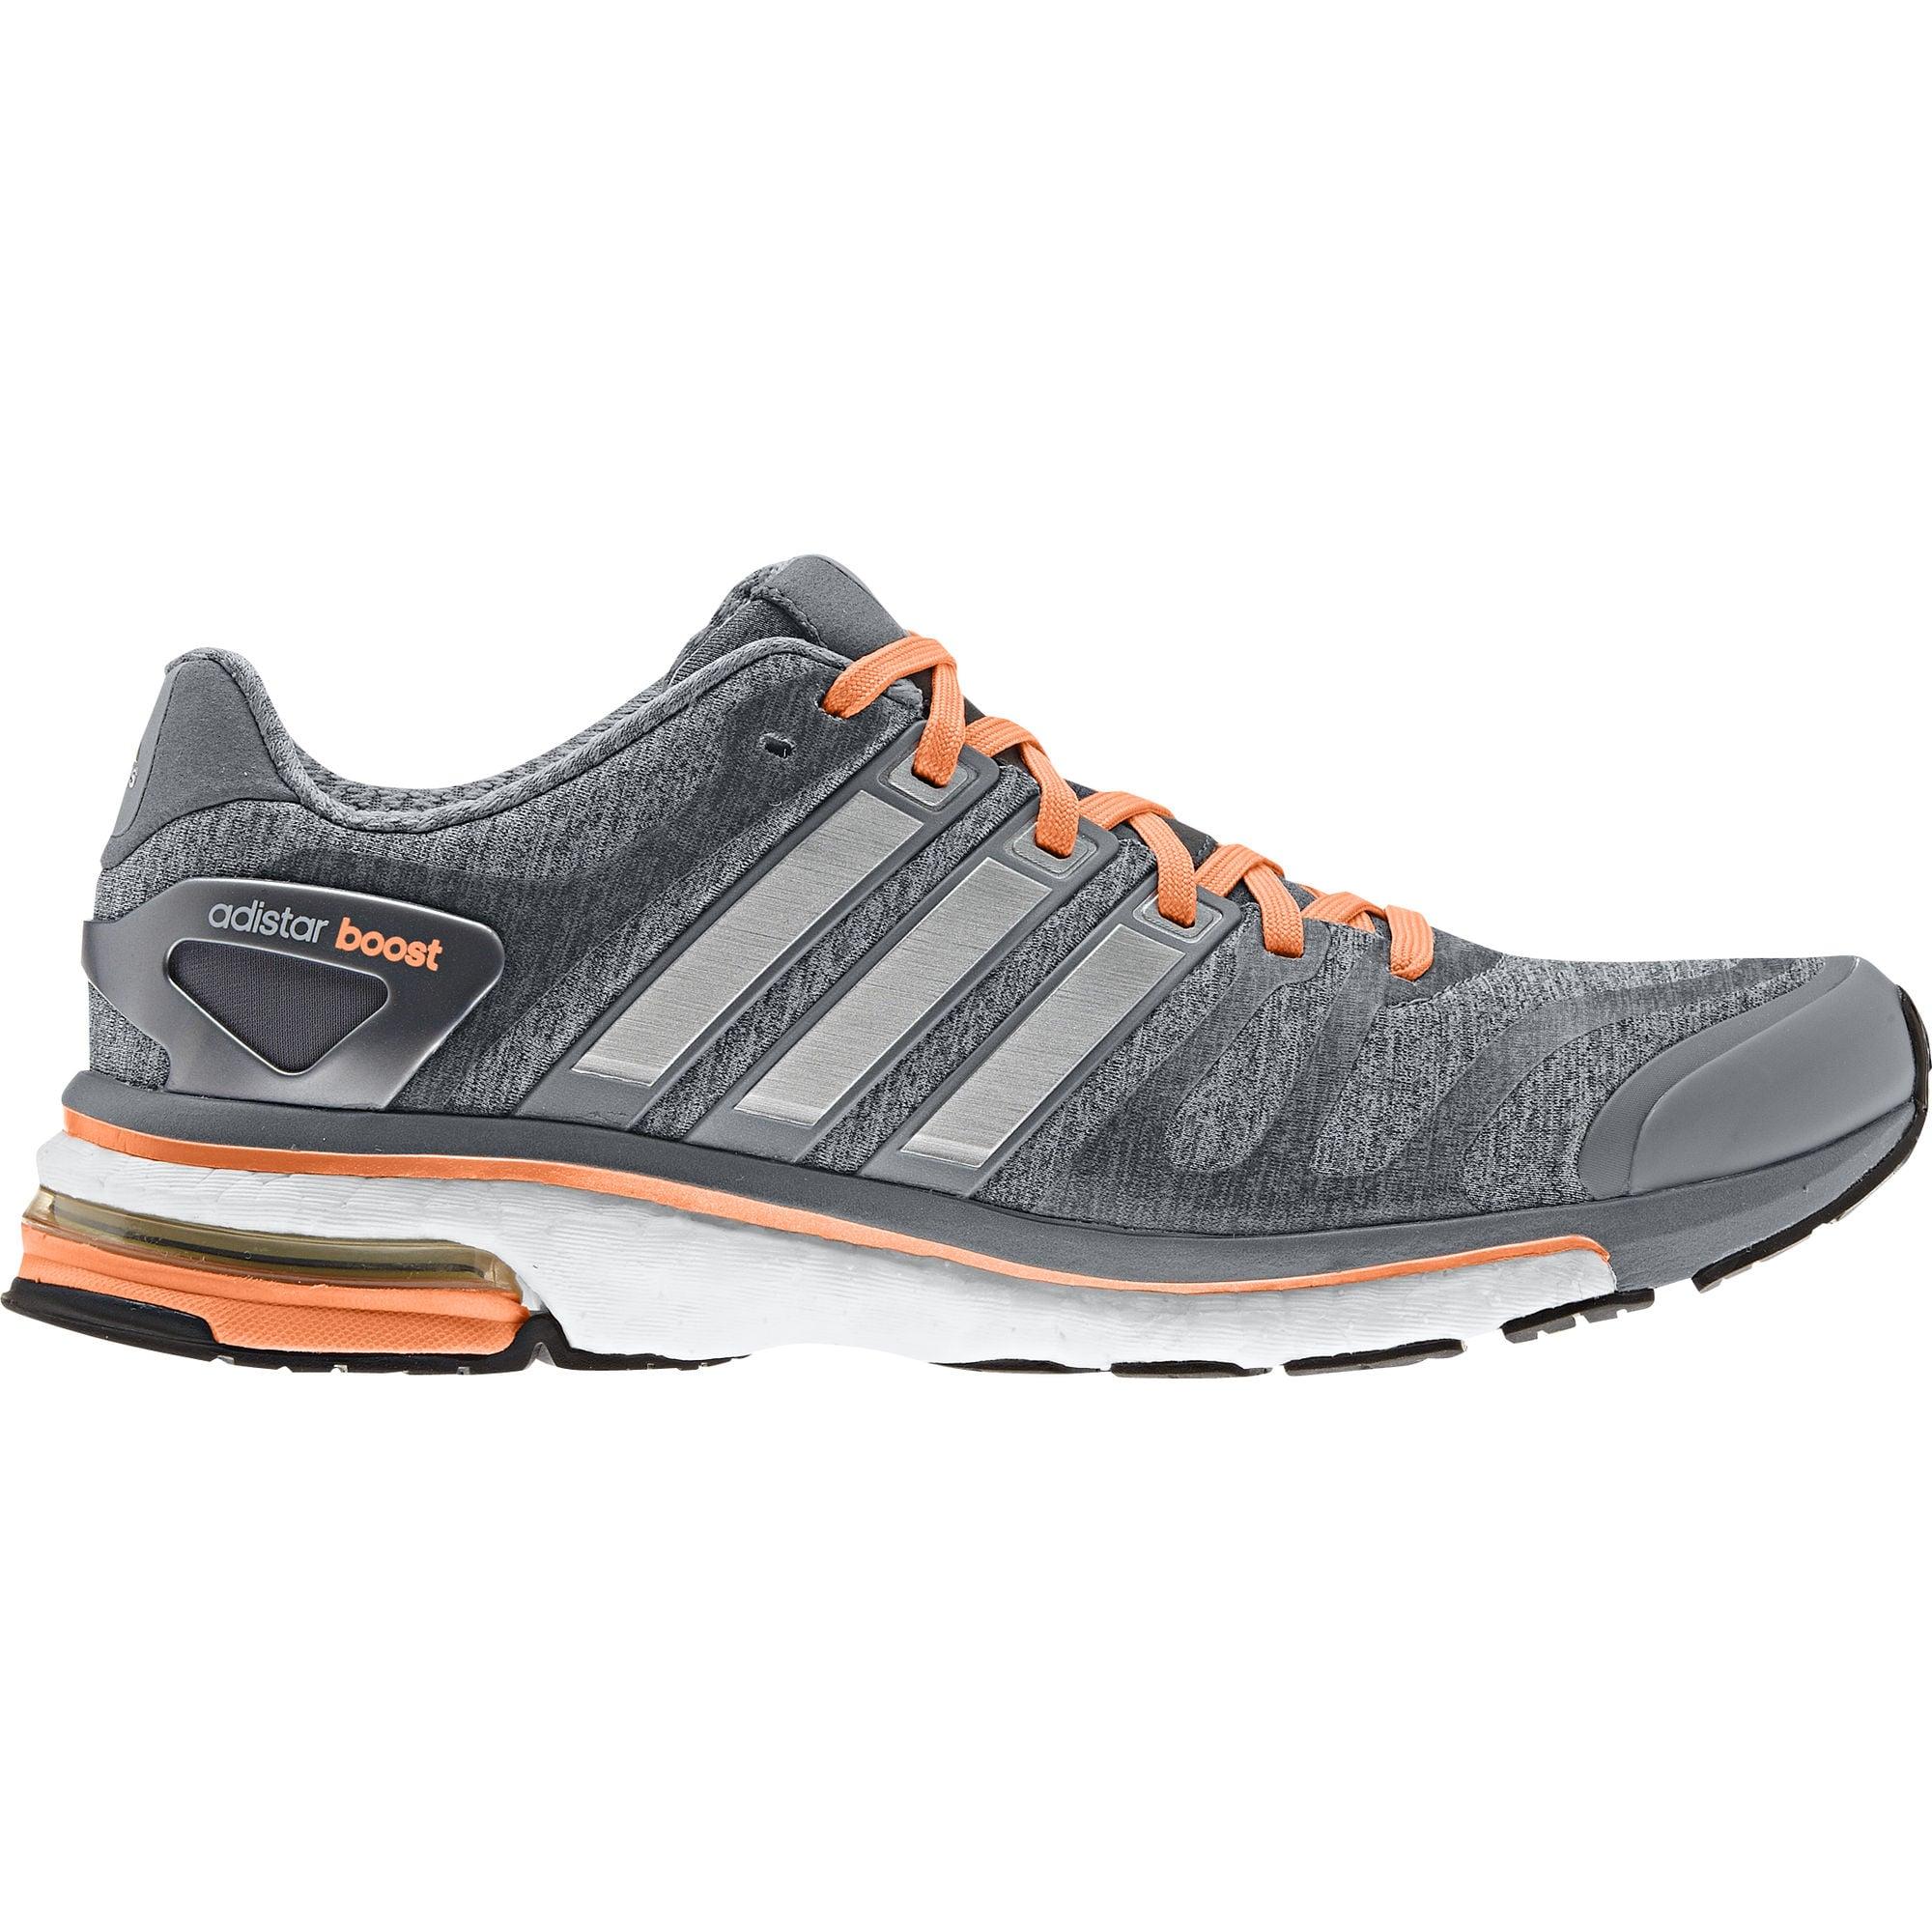 Adidas Womens Adistar Boost Stability Running Shoes